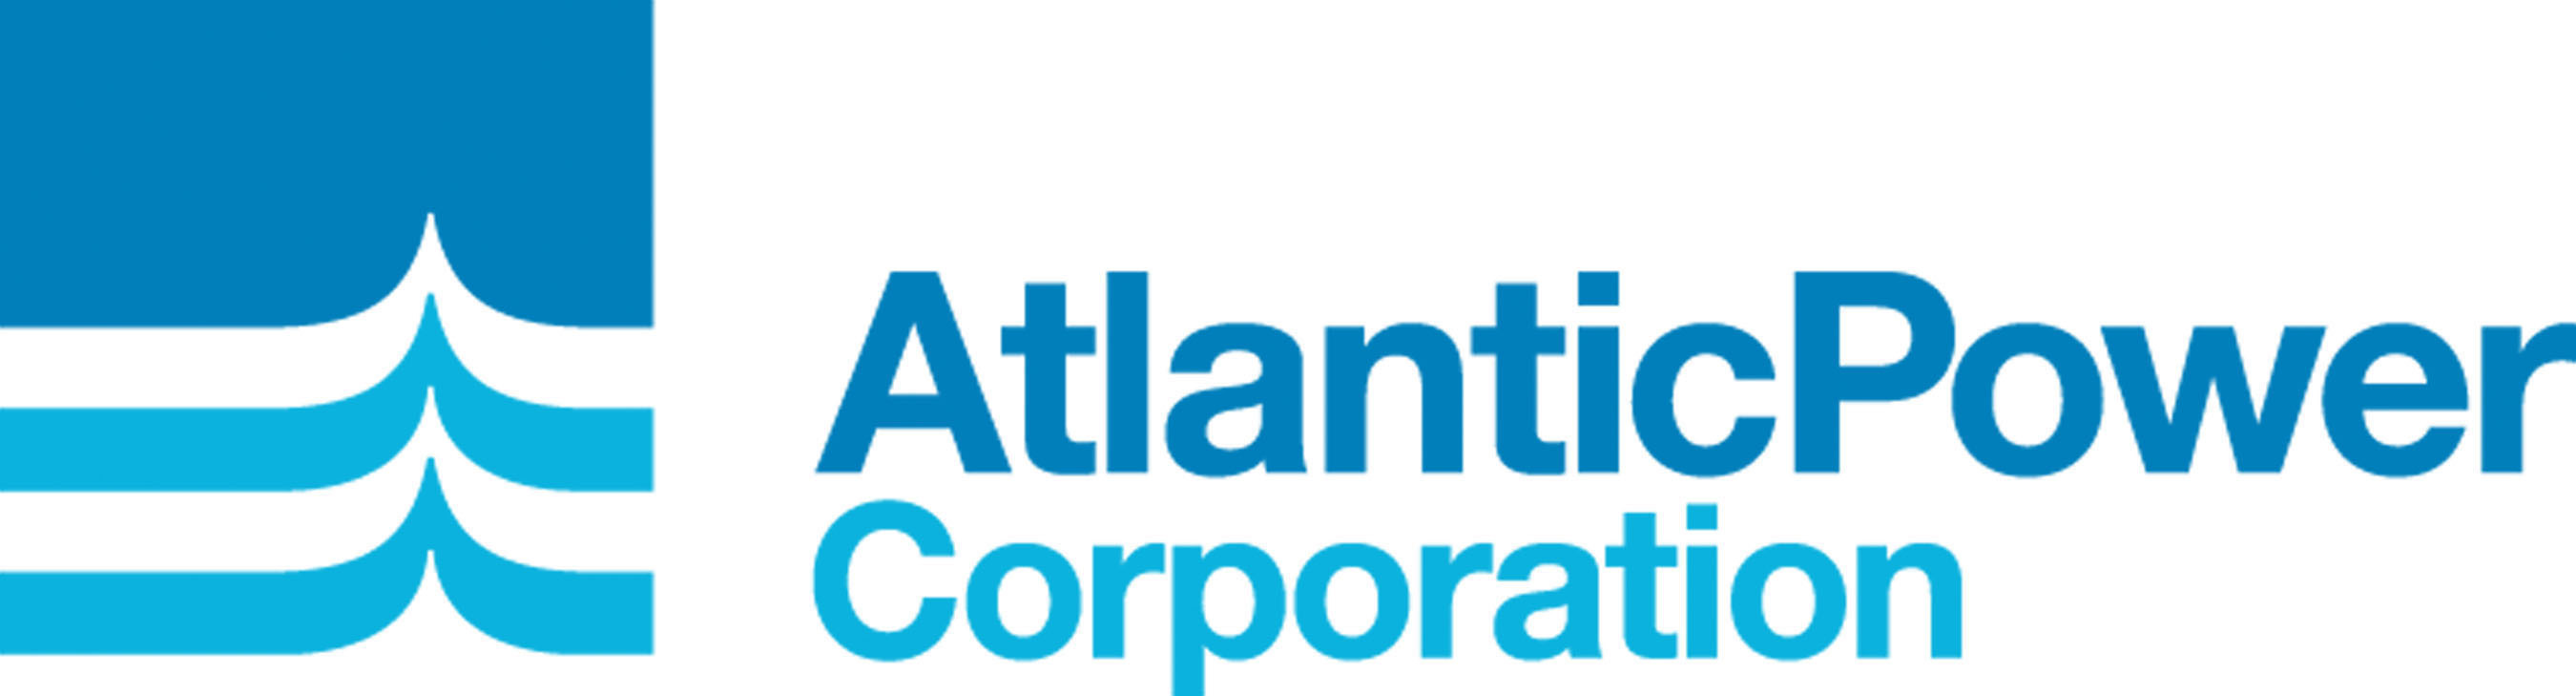 Atlantic Power Corporation Logo.